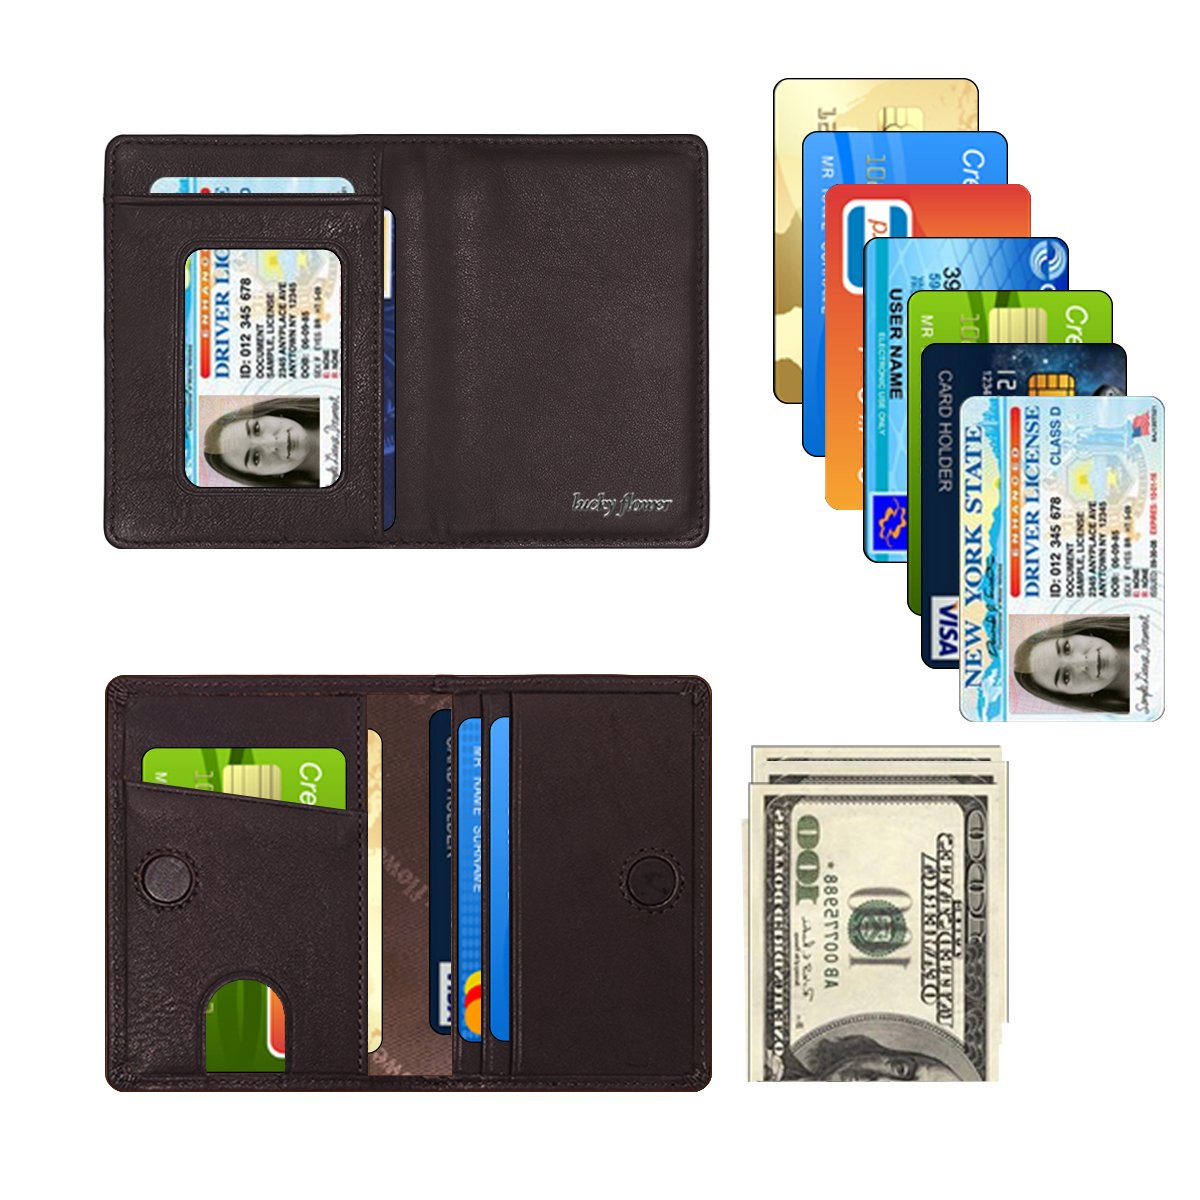 LUCKY FLOWER RFID Blocking Travel Wallet for Men,Minimalist Genuine Leather Slim Bifold Card Holder Purse(Coffee) by LUCKY FLOWER (Image #6)